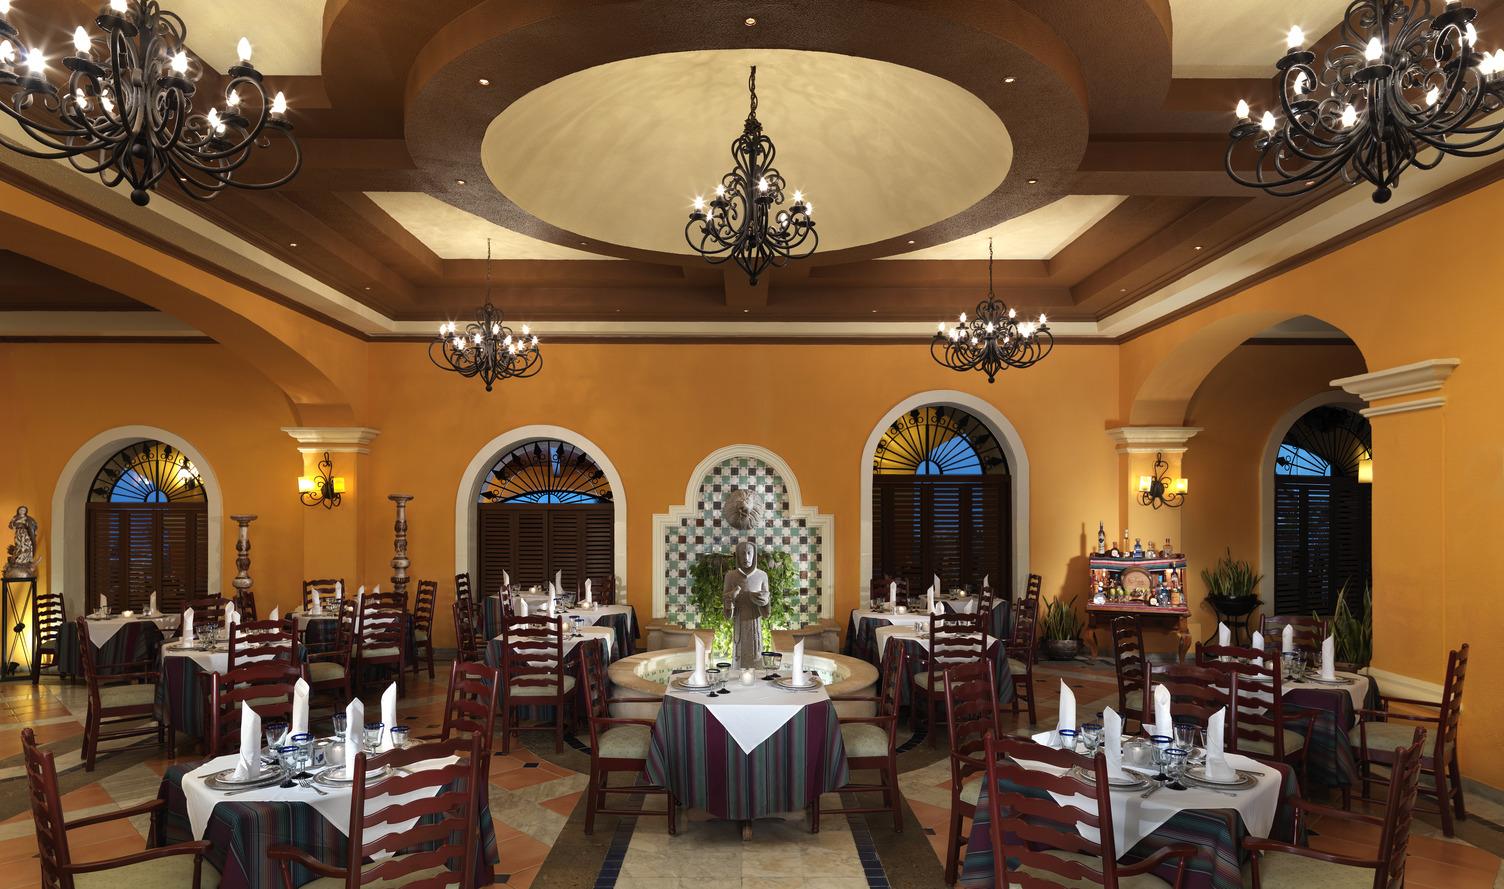 Travel Agency All-Inclusive Resort Heaven at Hard Rock Hotel Riviera Maya 43